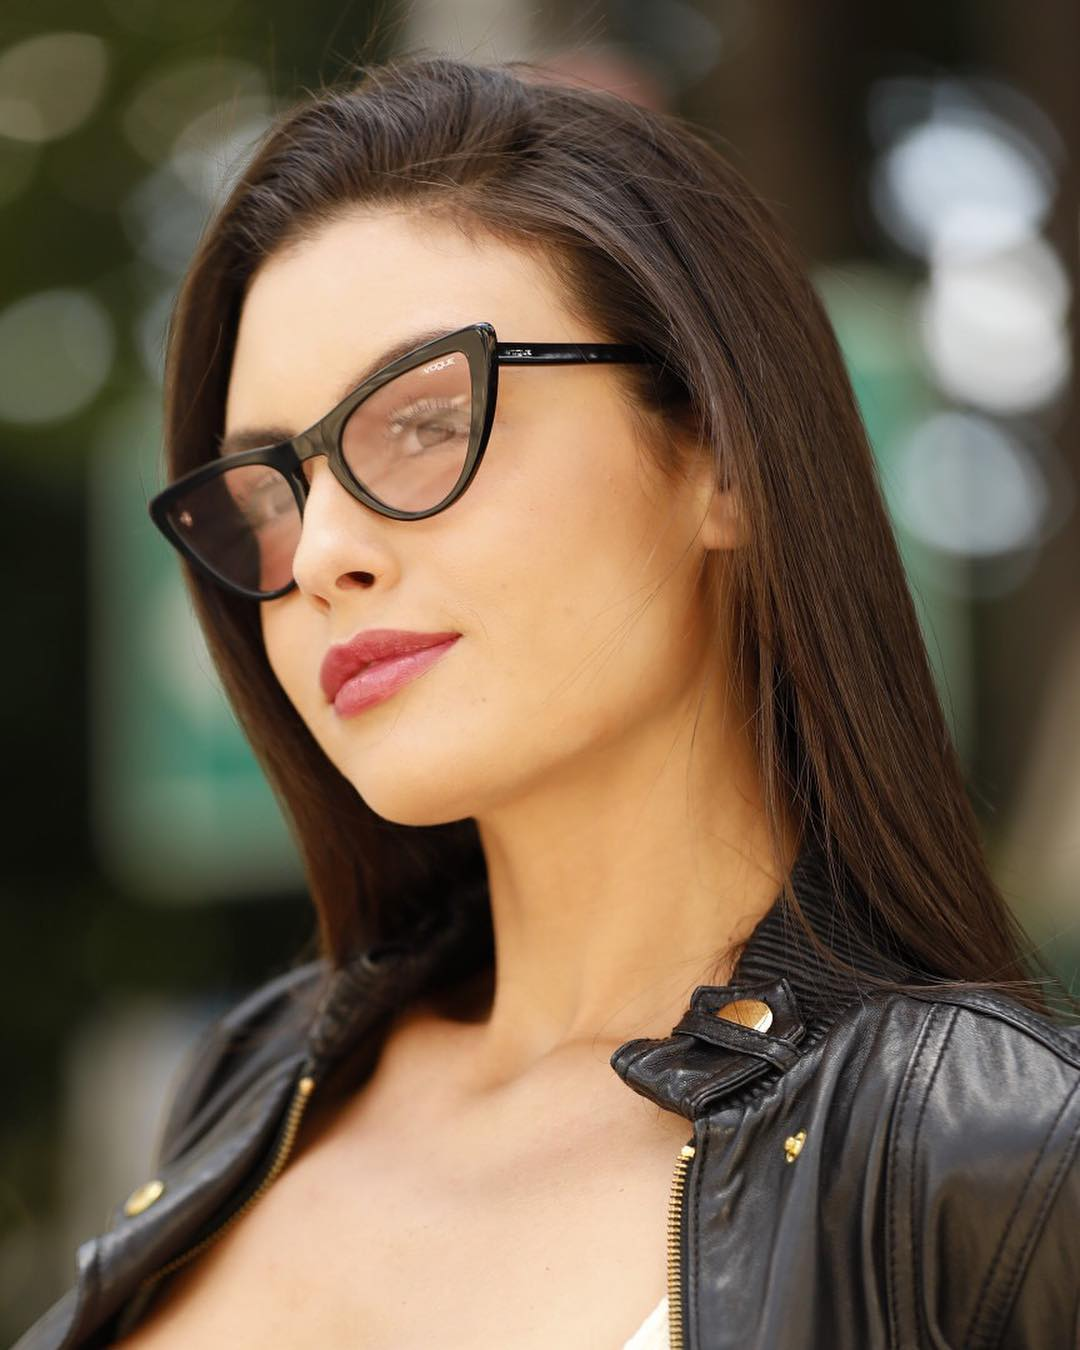 marjorie marcelle, miss grand brasil 2019. - Página 4 56277910